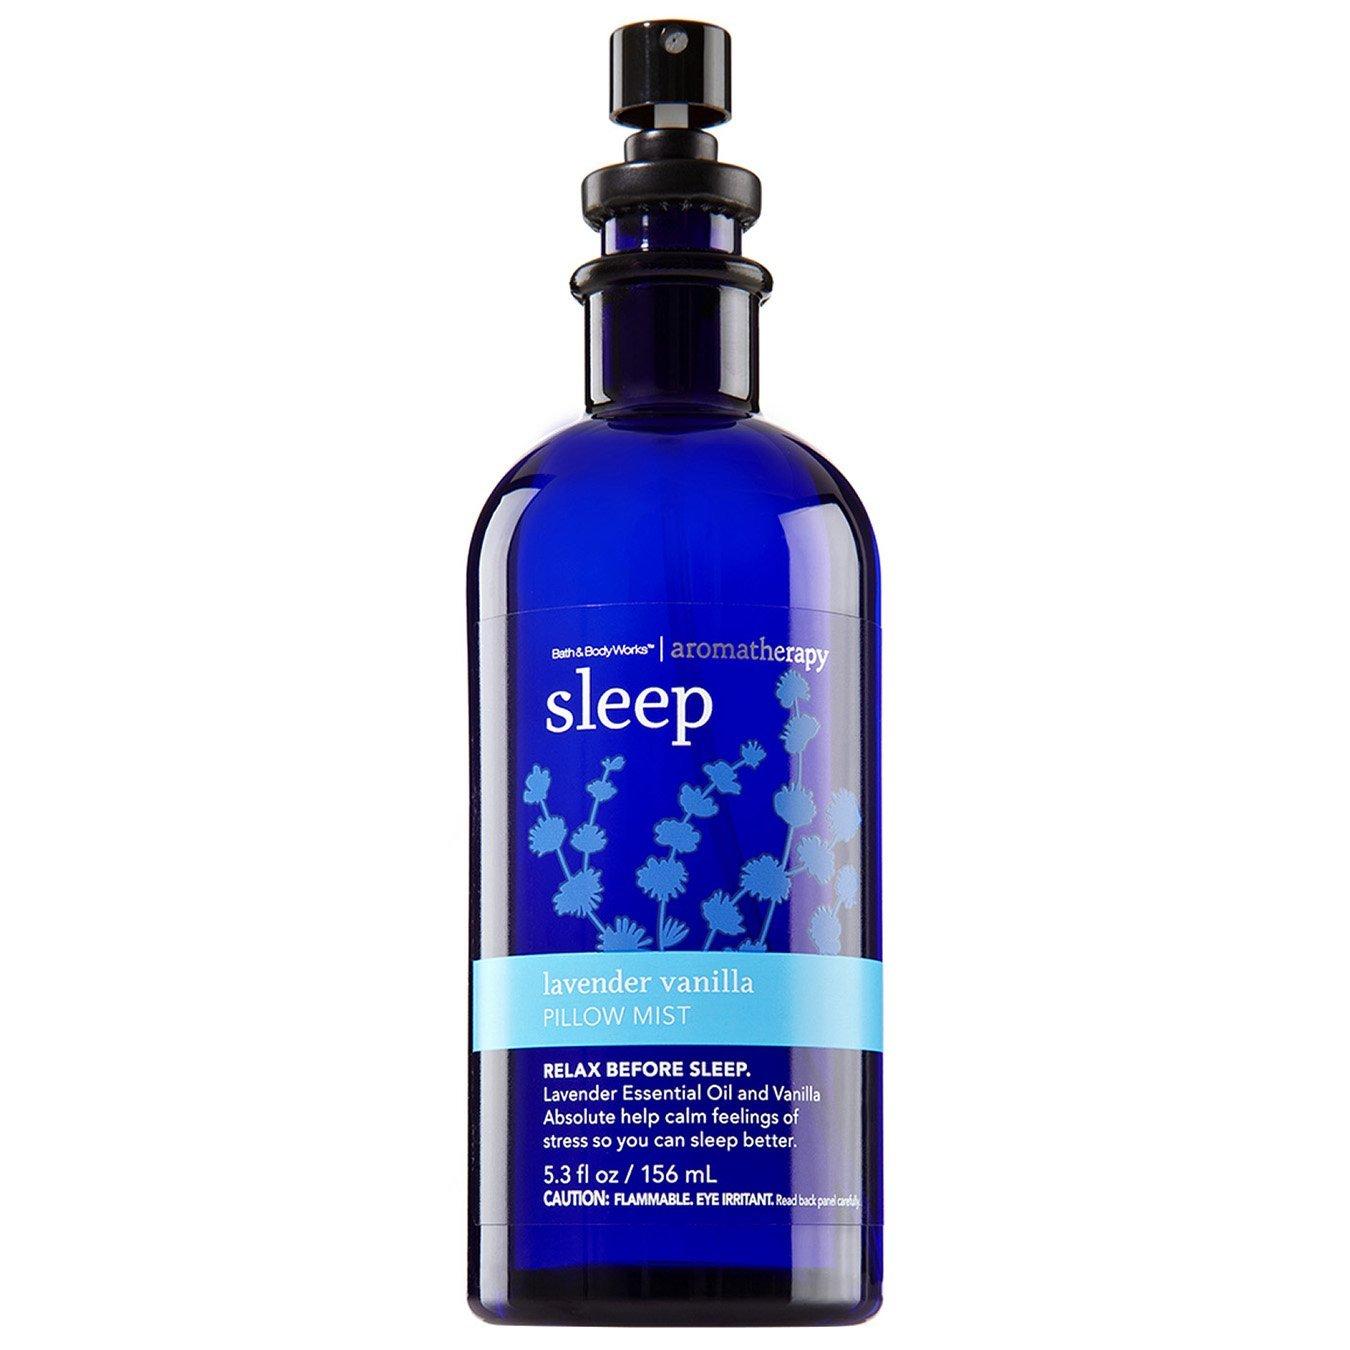 Bath and Body Works Aromatherapy Sleep Lavender Vanilla Pillow Mist 5.3 fl oz Original Retired Fragrance